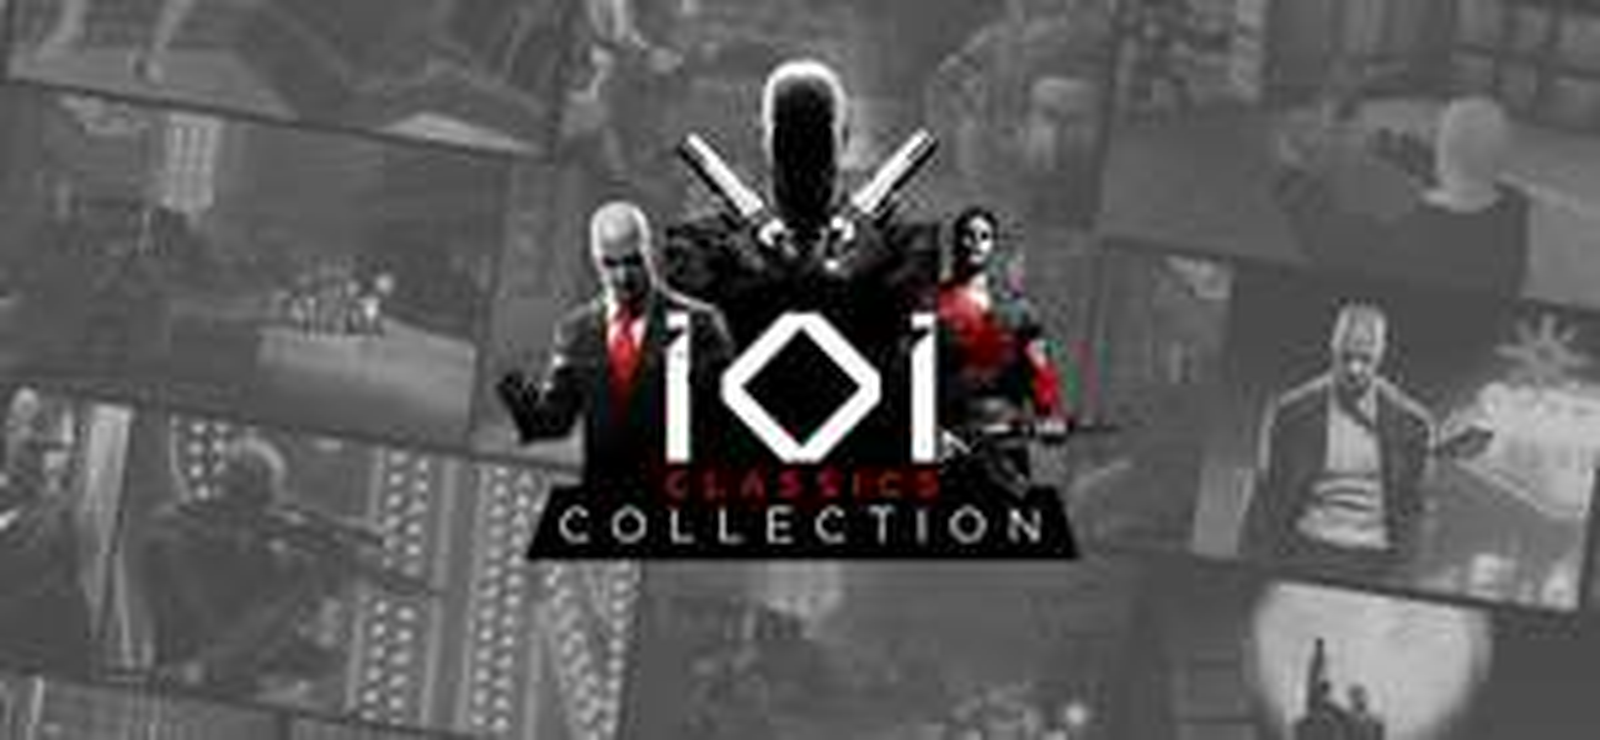 IOI Collection (6 Games) £2.42 - Gog Russia via VPN (Hitman , Freedom fighters etc)